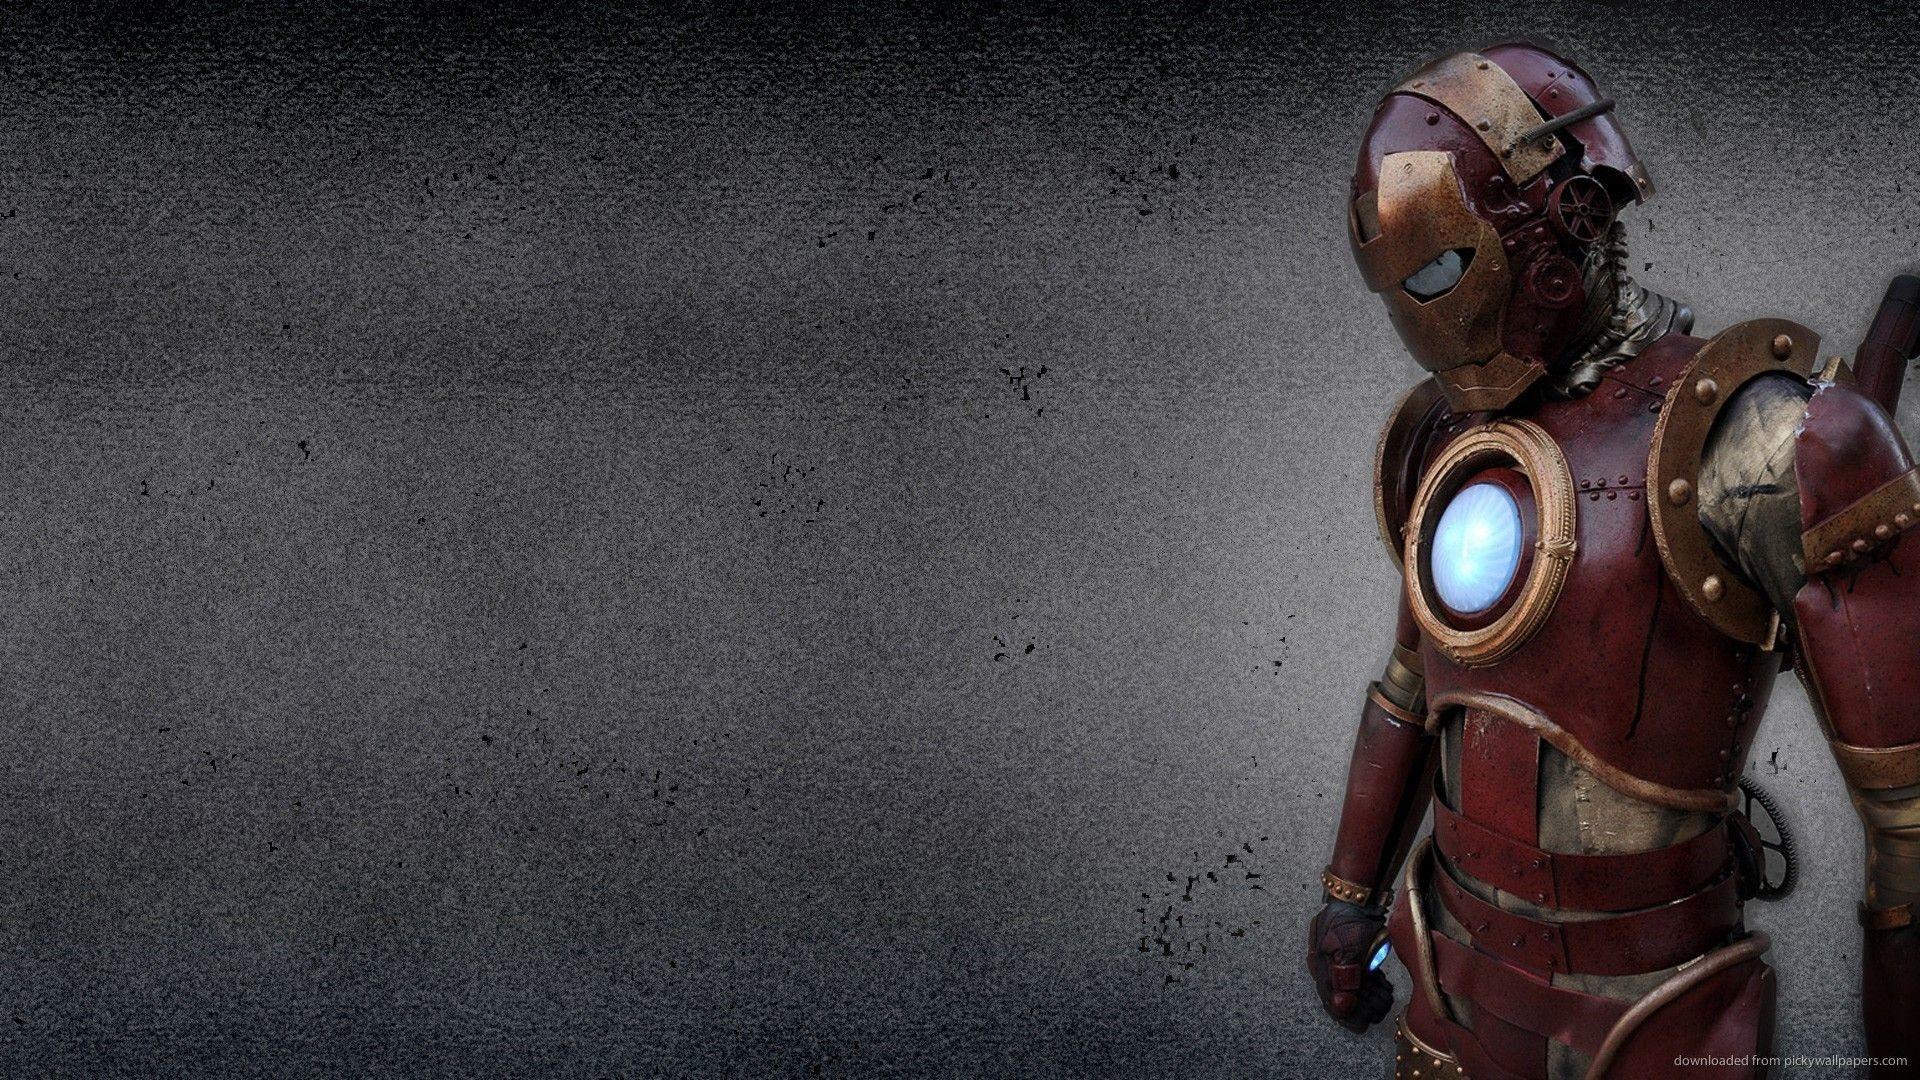 11 Iron Man Steampunk wallpaper 1582 :: Steampunk Hd ..